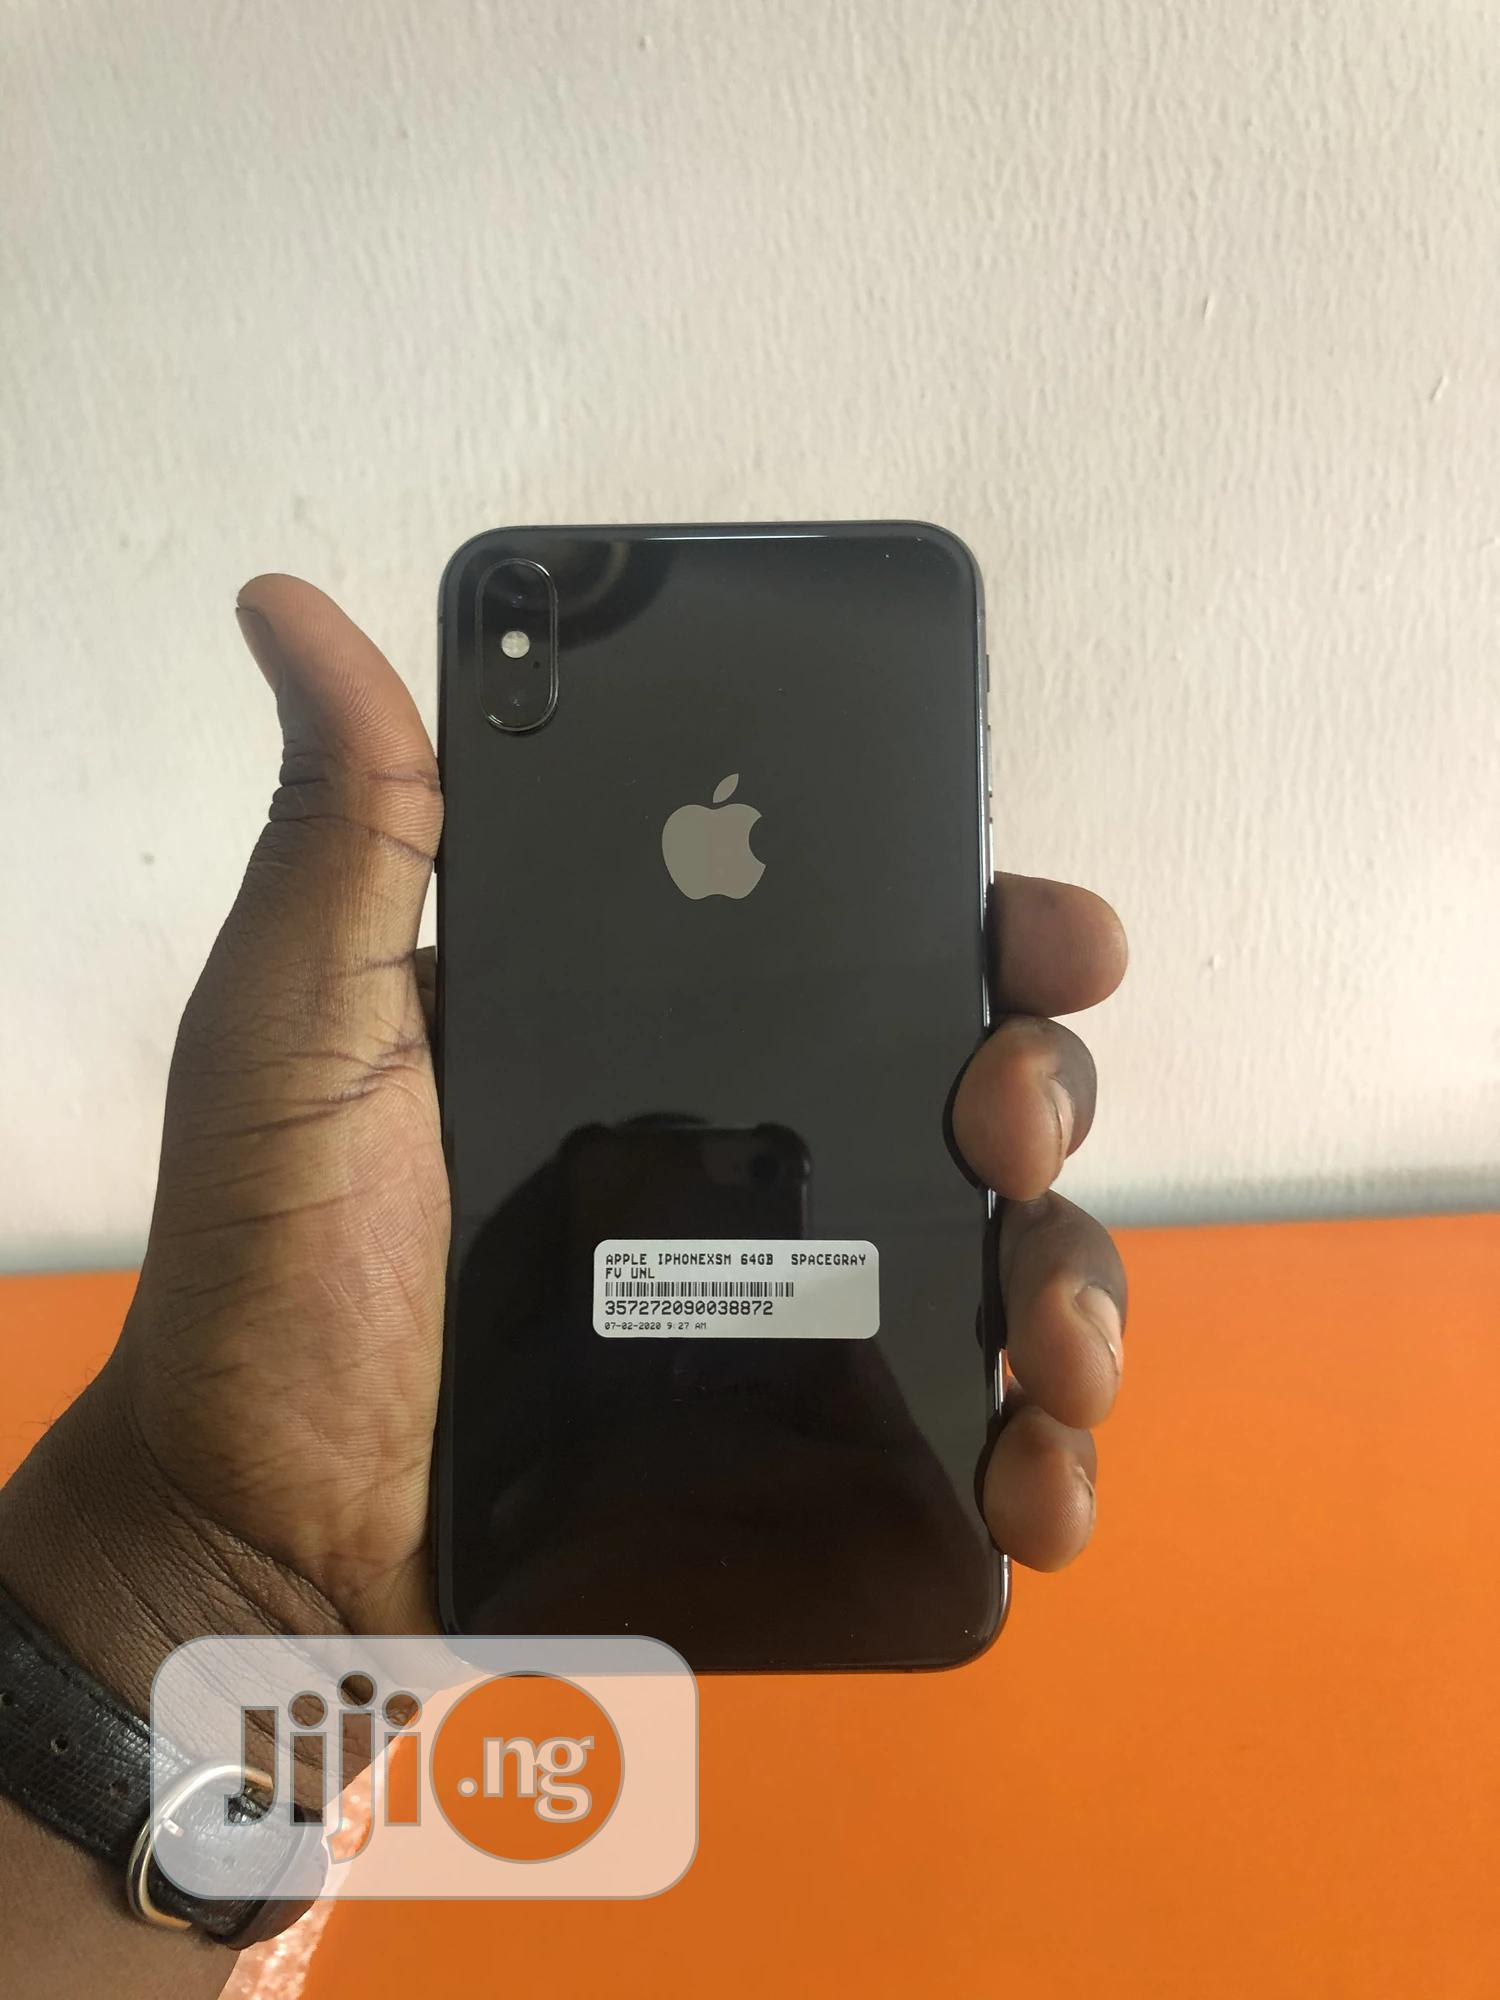 Apple iPhone XS Max 64 GB Black | Mobile Phones for sale in Osogbo, Osun State, Nigeria